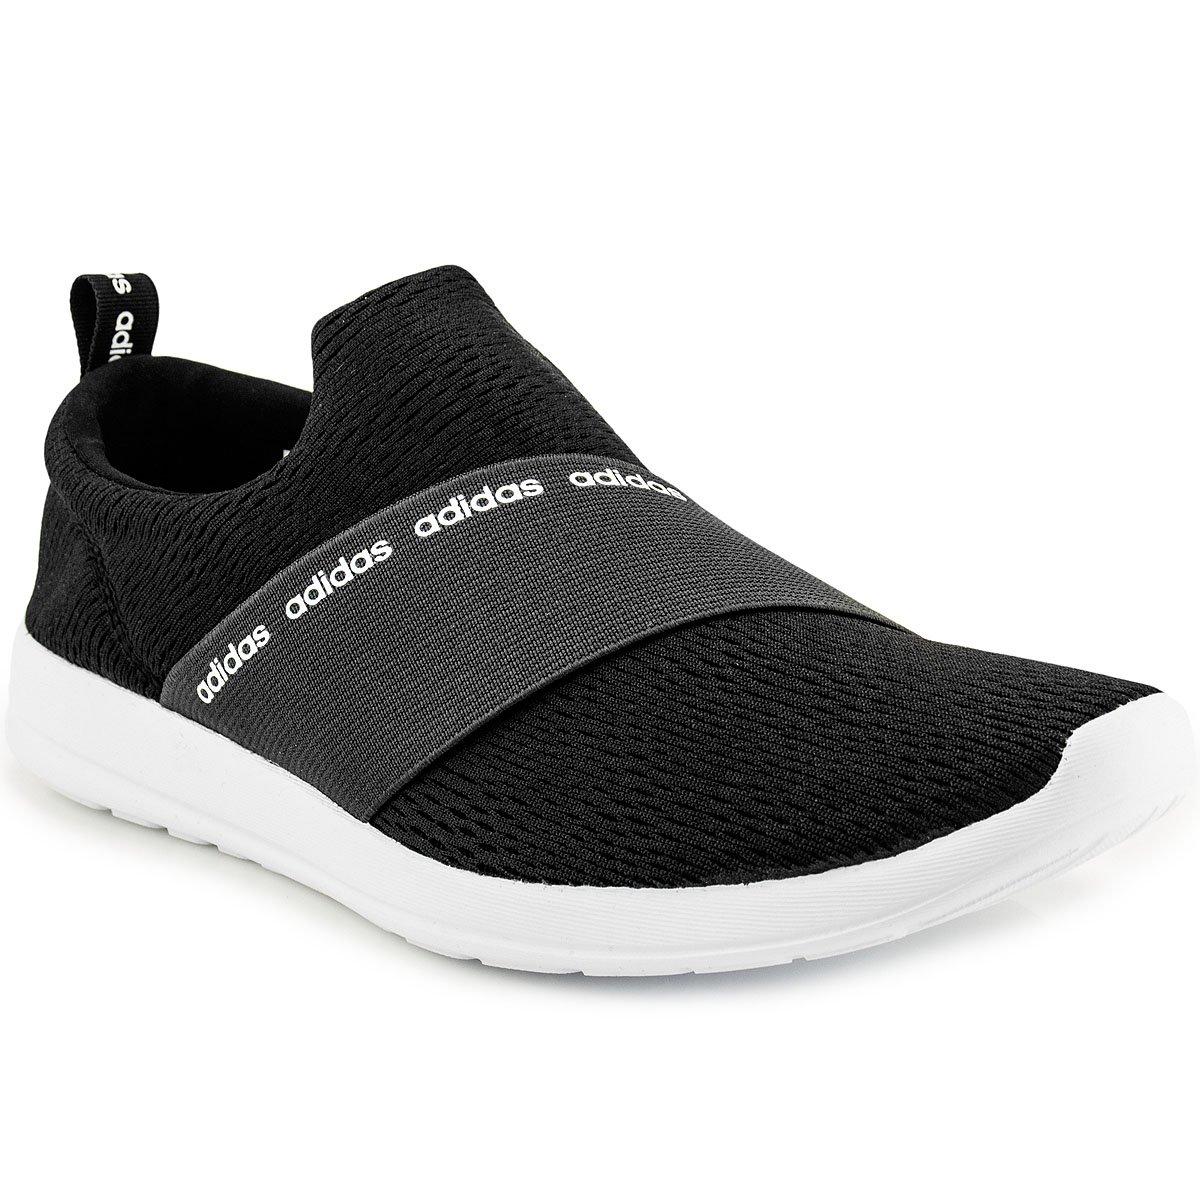 be03dc47f3e Tênis Adidas CF Refine Adapt Feminino